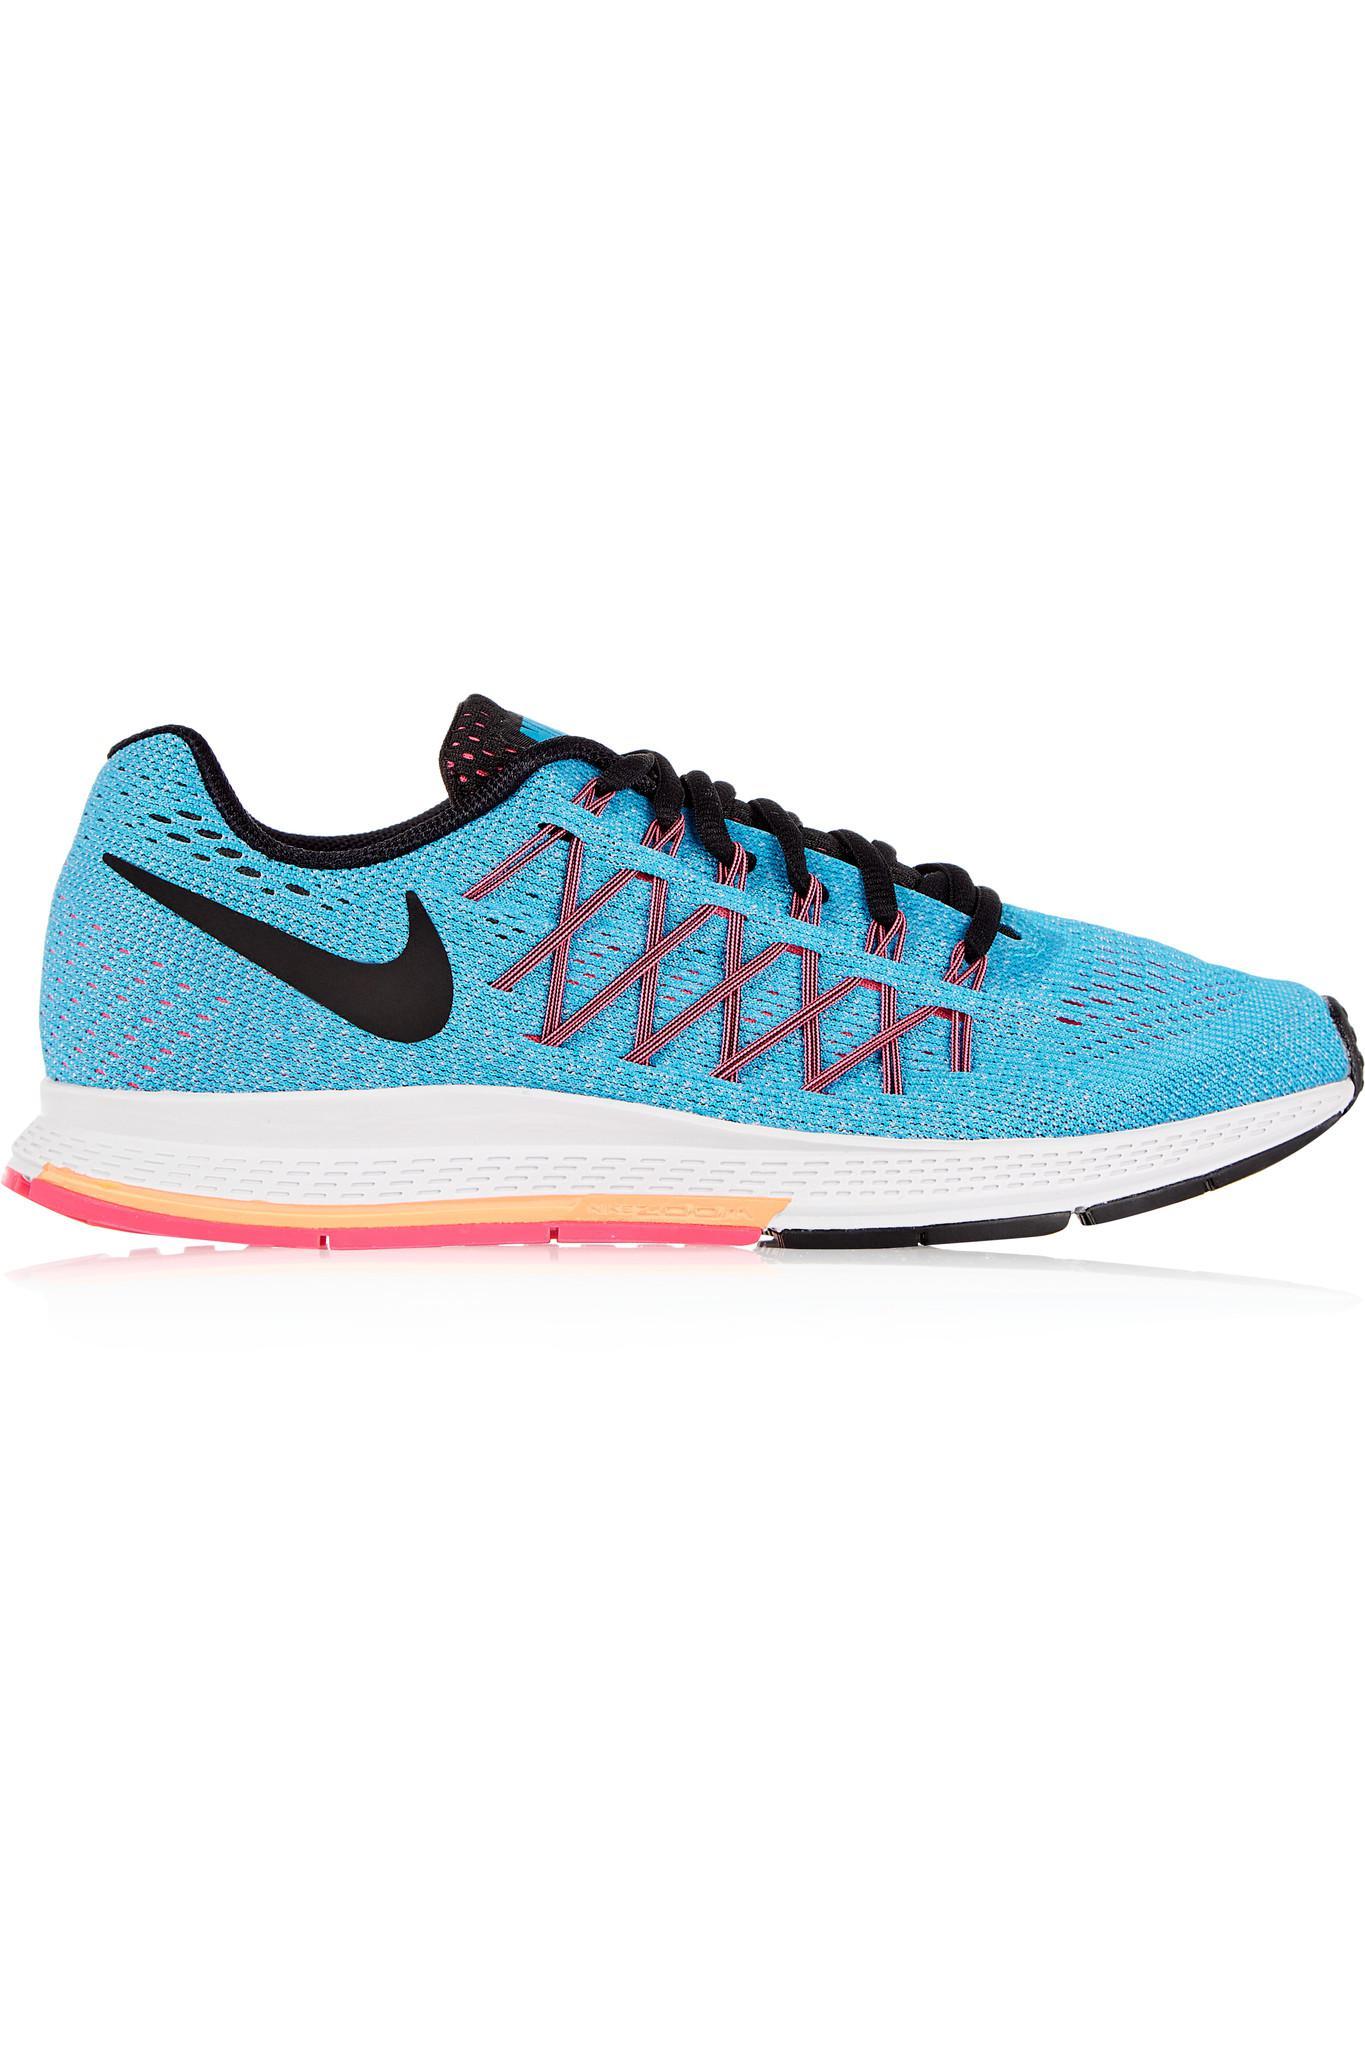 new arrival 97a43 9b300 Lyst - Nike Air Zoom Pegasus 32 Mesh Sneakers in Blue